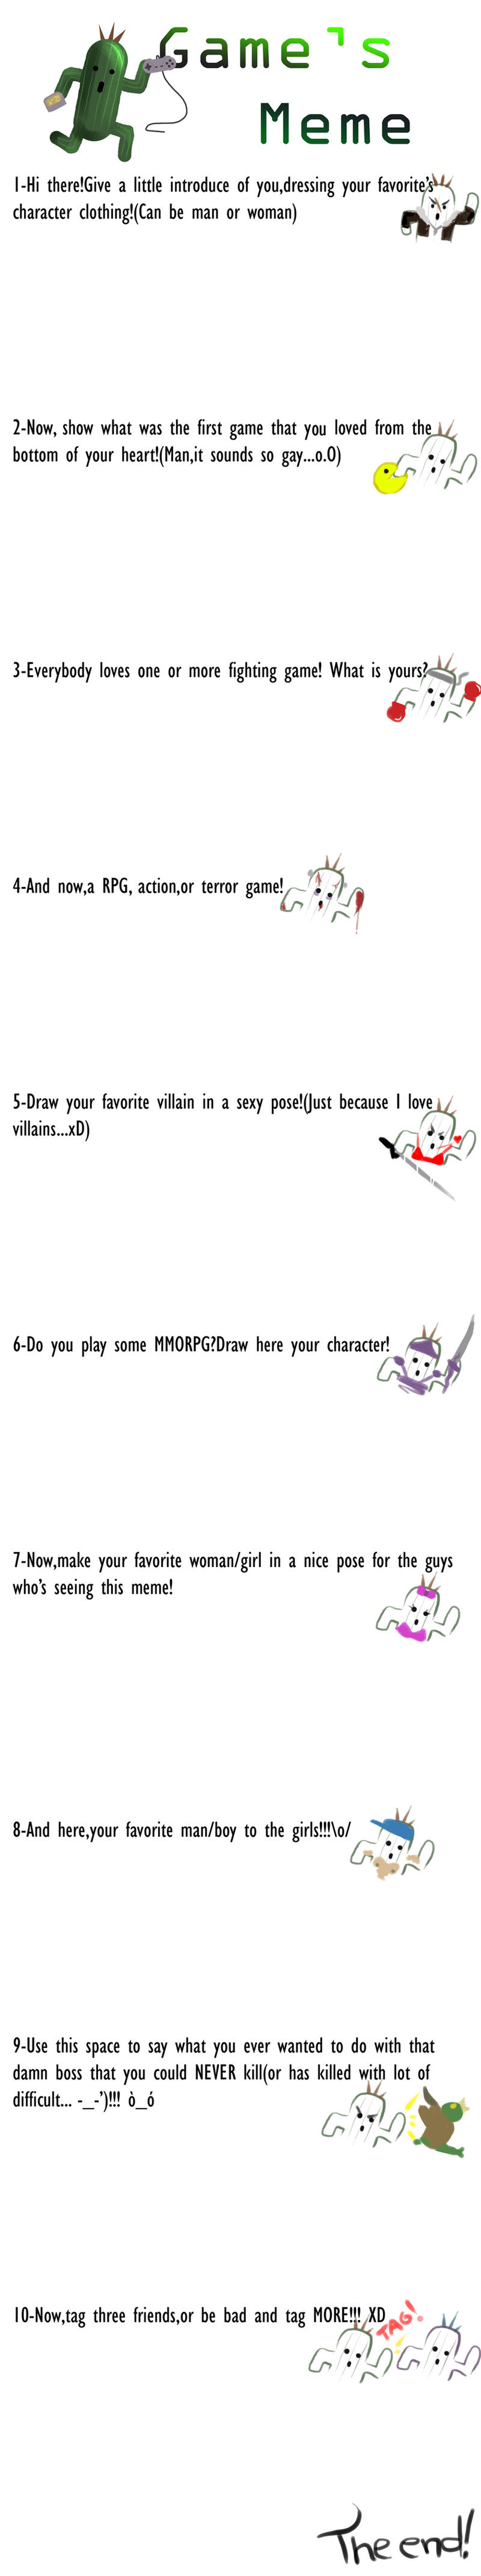 Game's Meme by RinoaPereira